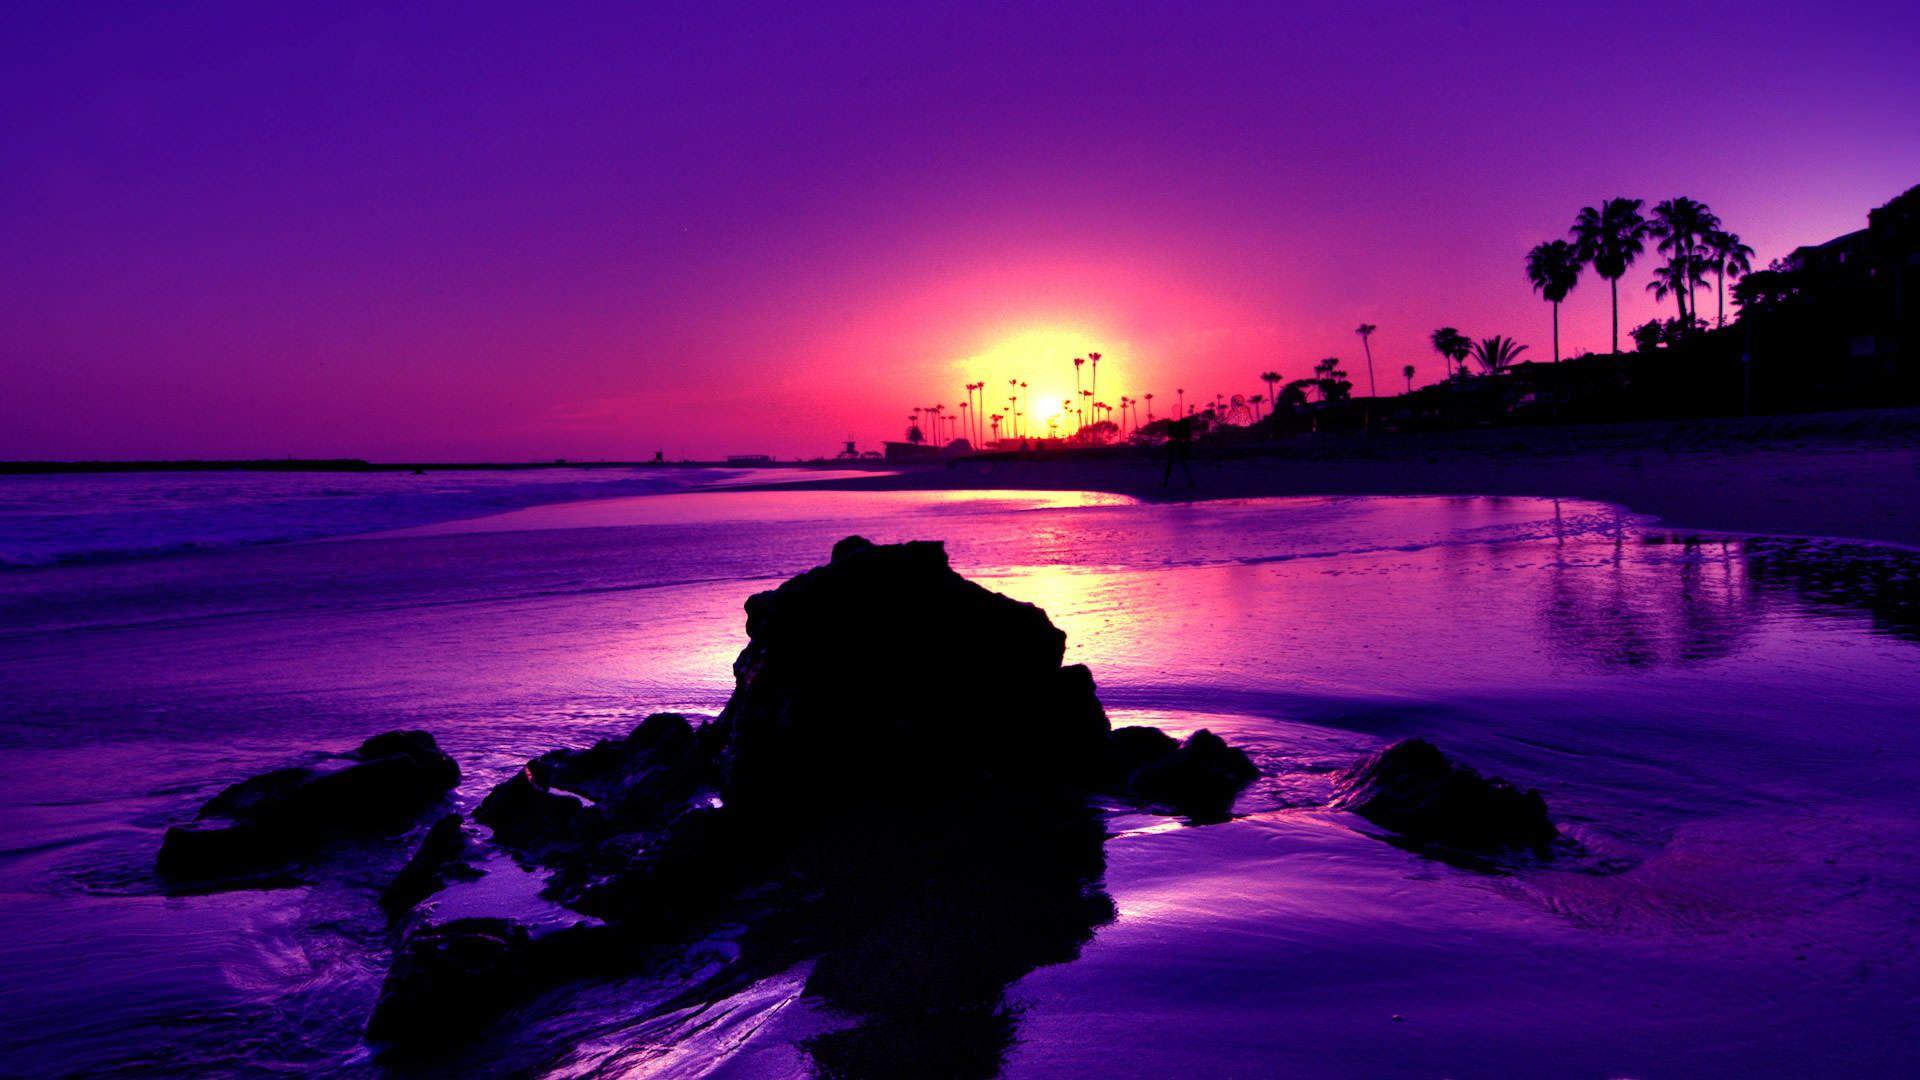 Relaxing Purple Wallpapers   Top Relaxing Purple Backgrounds 1920x1080